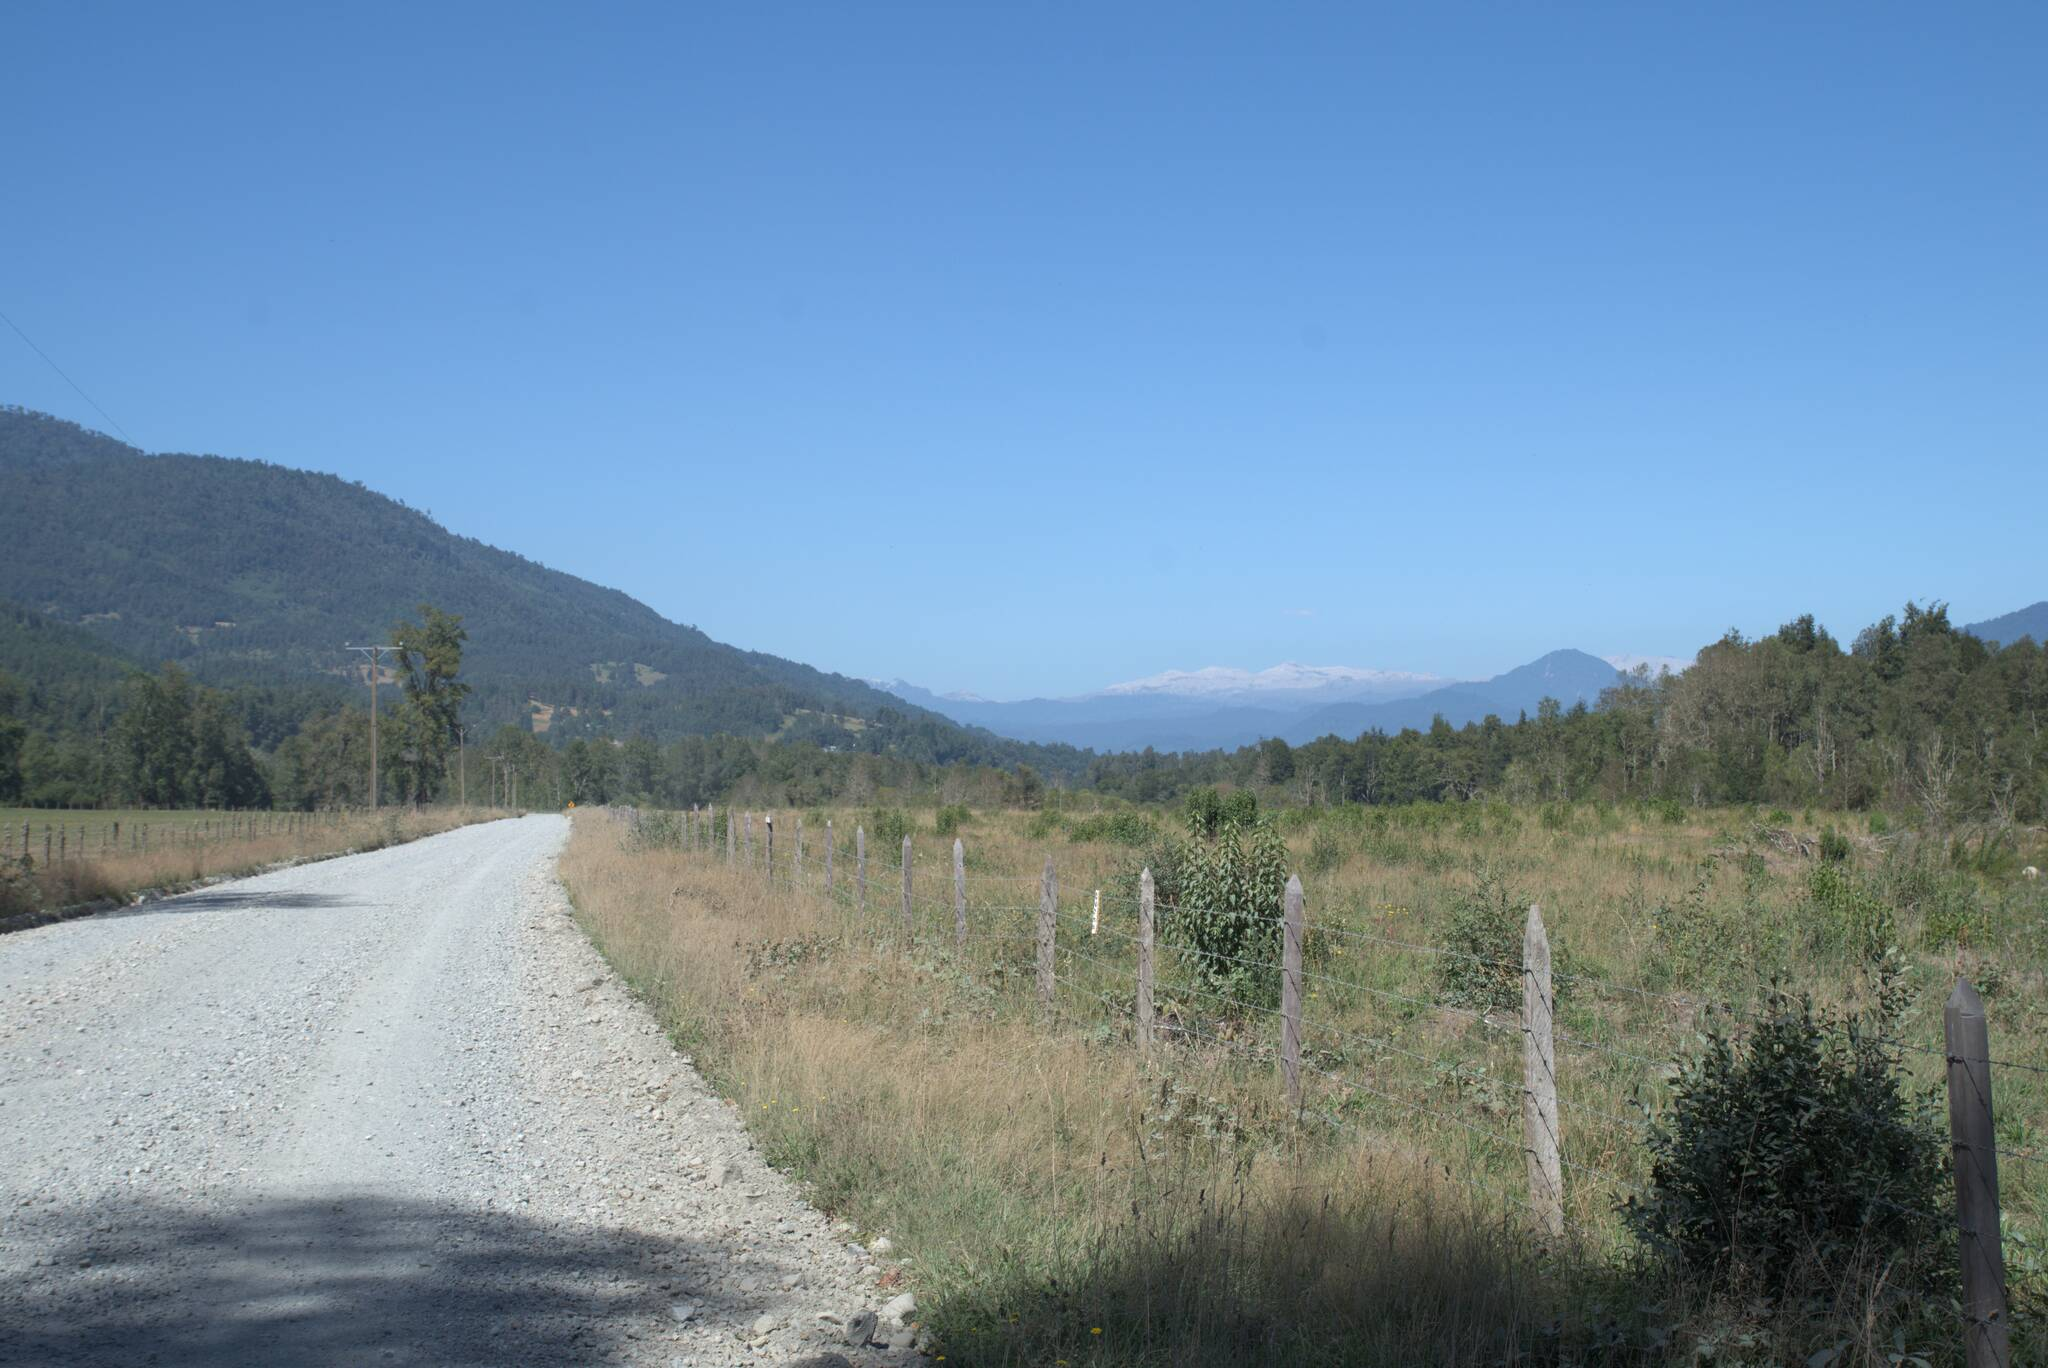 To białe daleko, to kompleks wulkanów Puyehue-Cordón Caulle